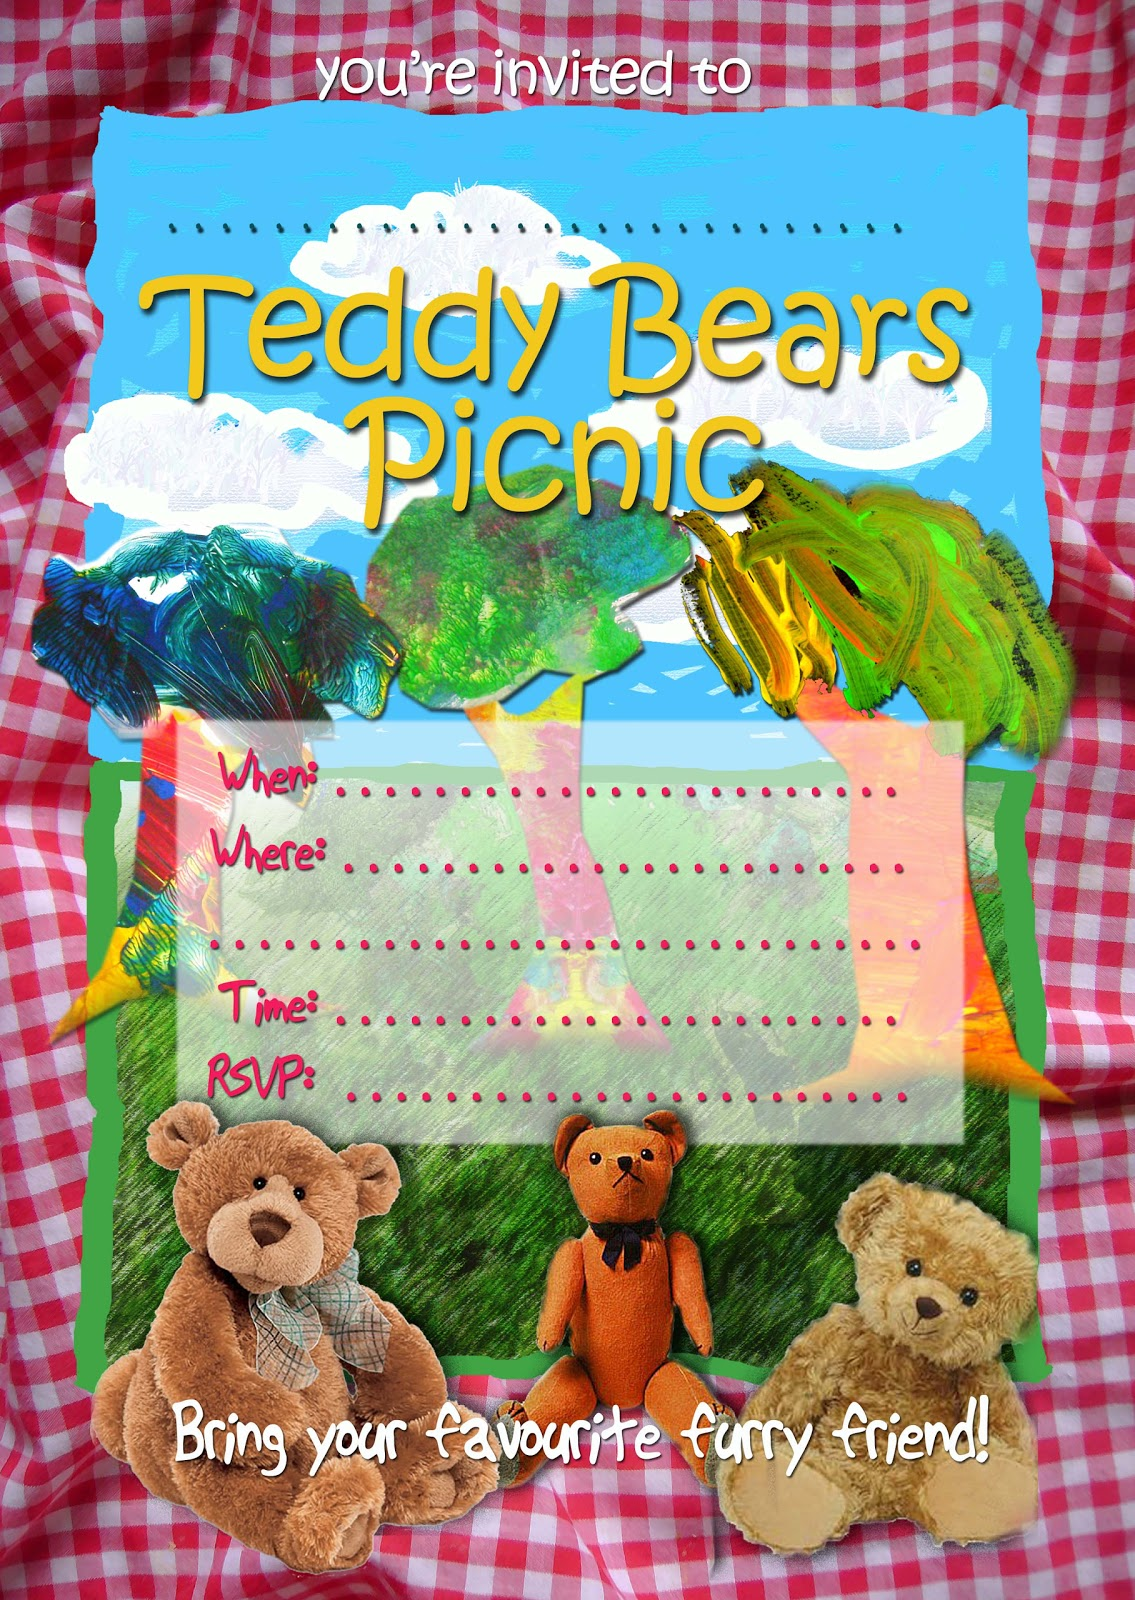 Teddy Bears Picnic Invitation Template – Picnic Invitation Template